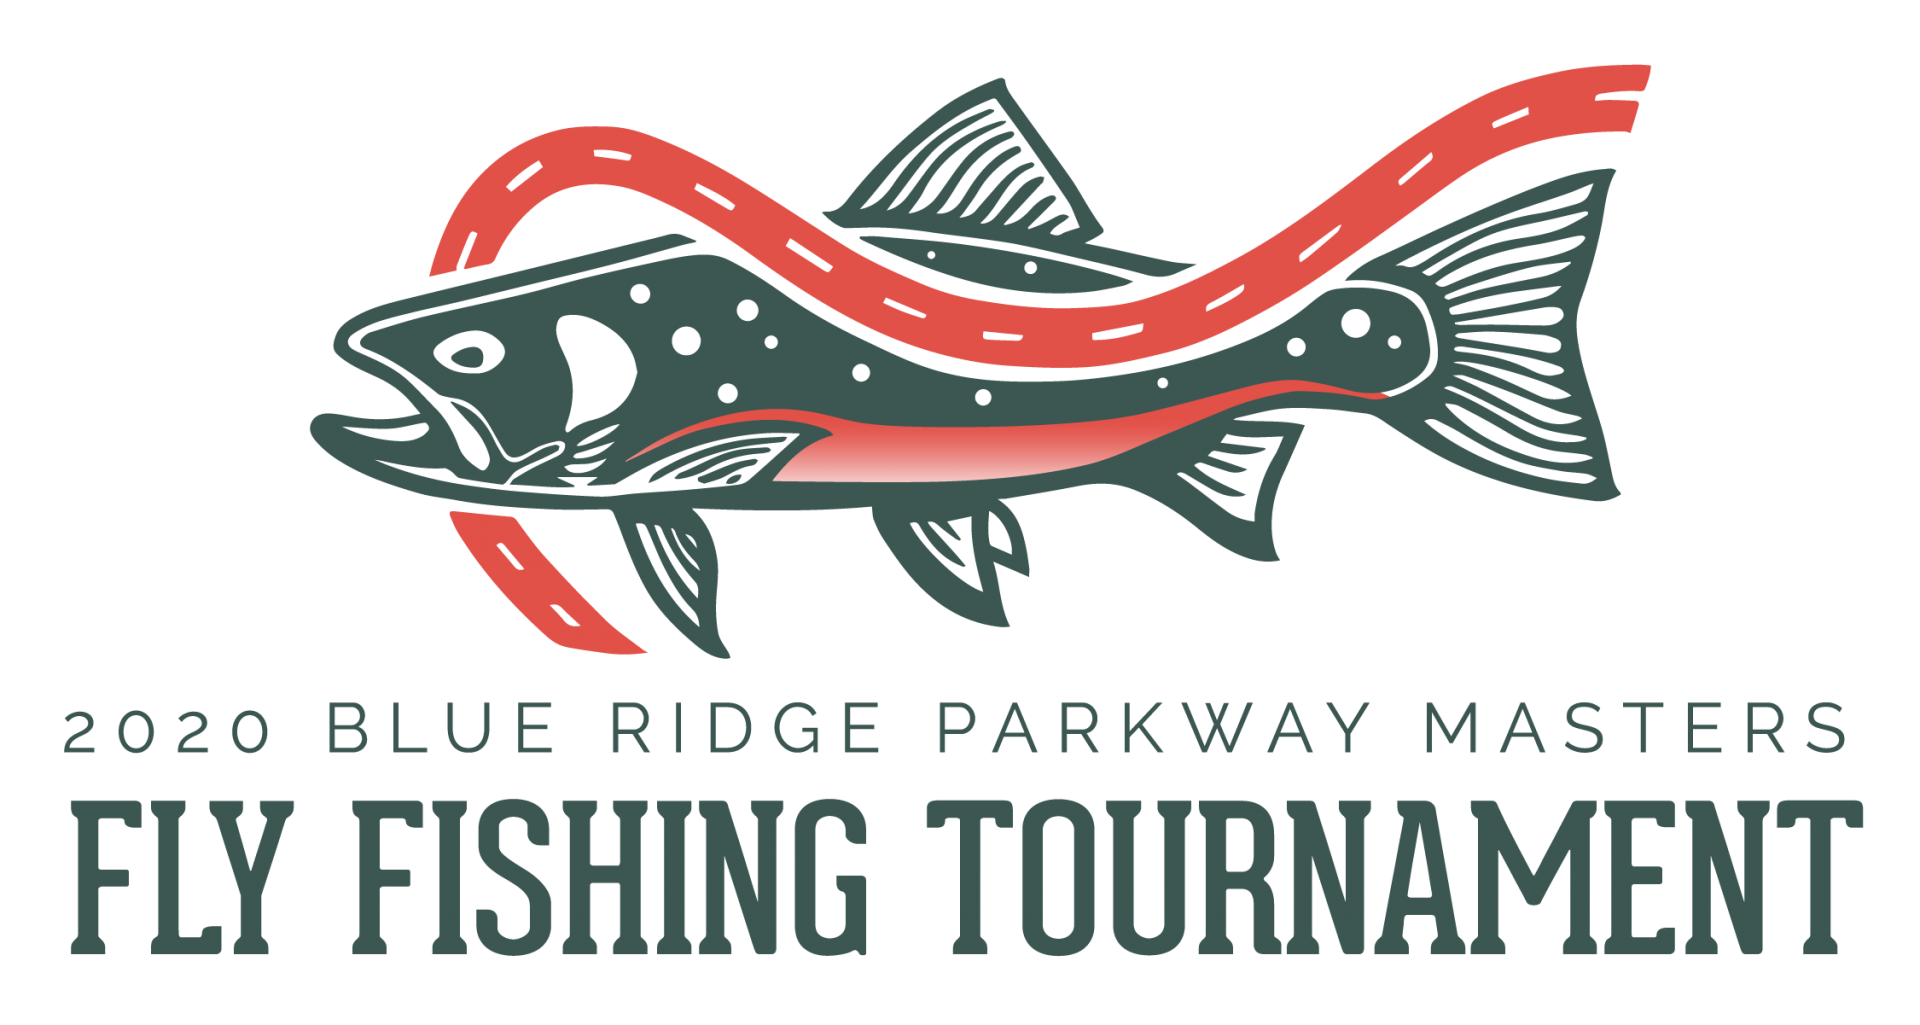 Blue Ridge Parkway Masters Fly Fishing Tournament logo